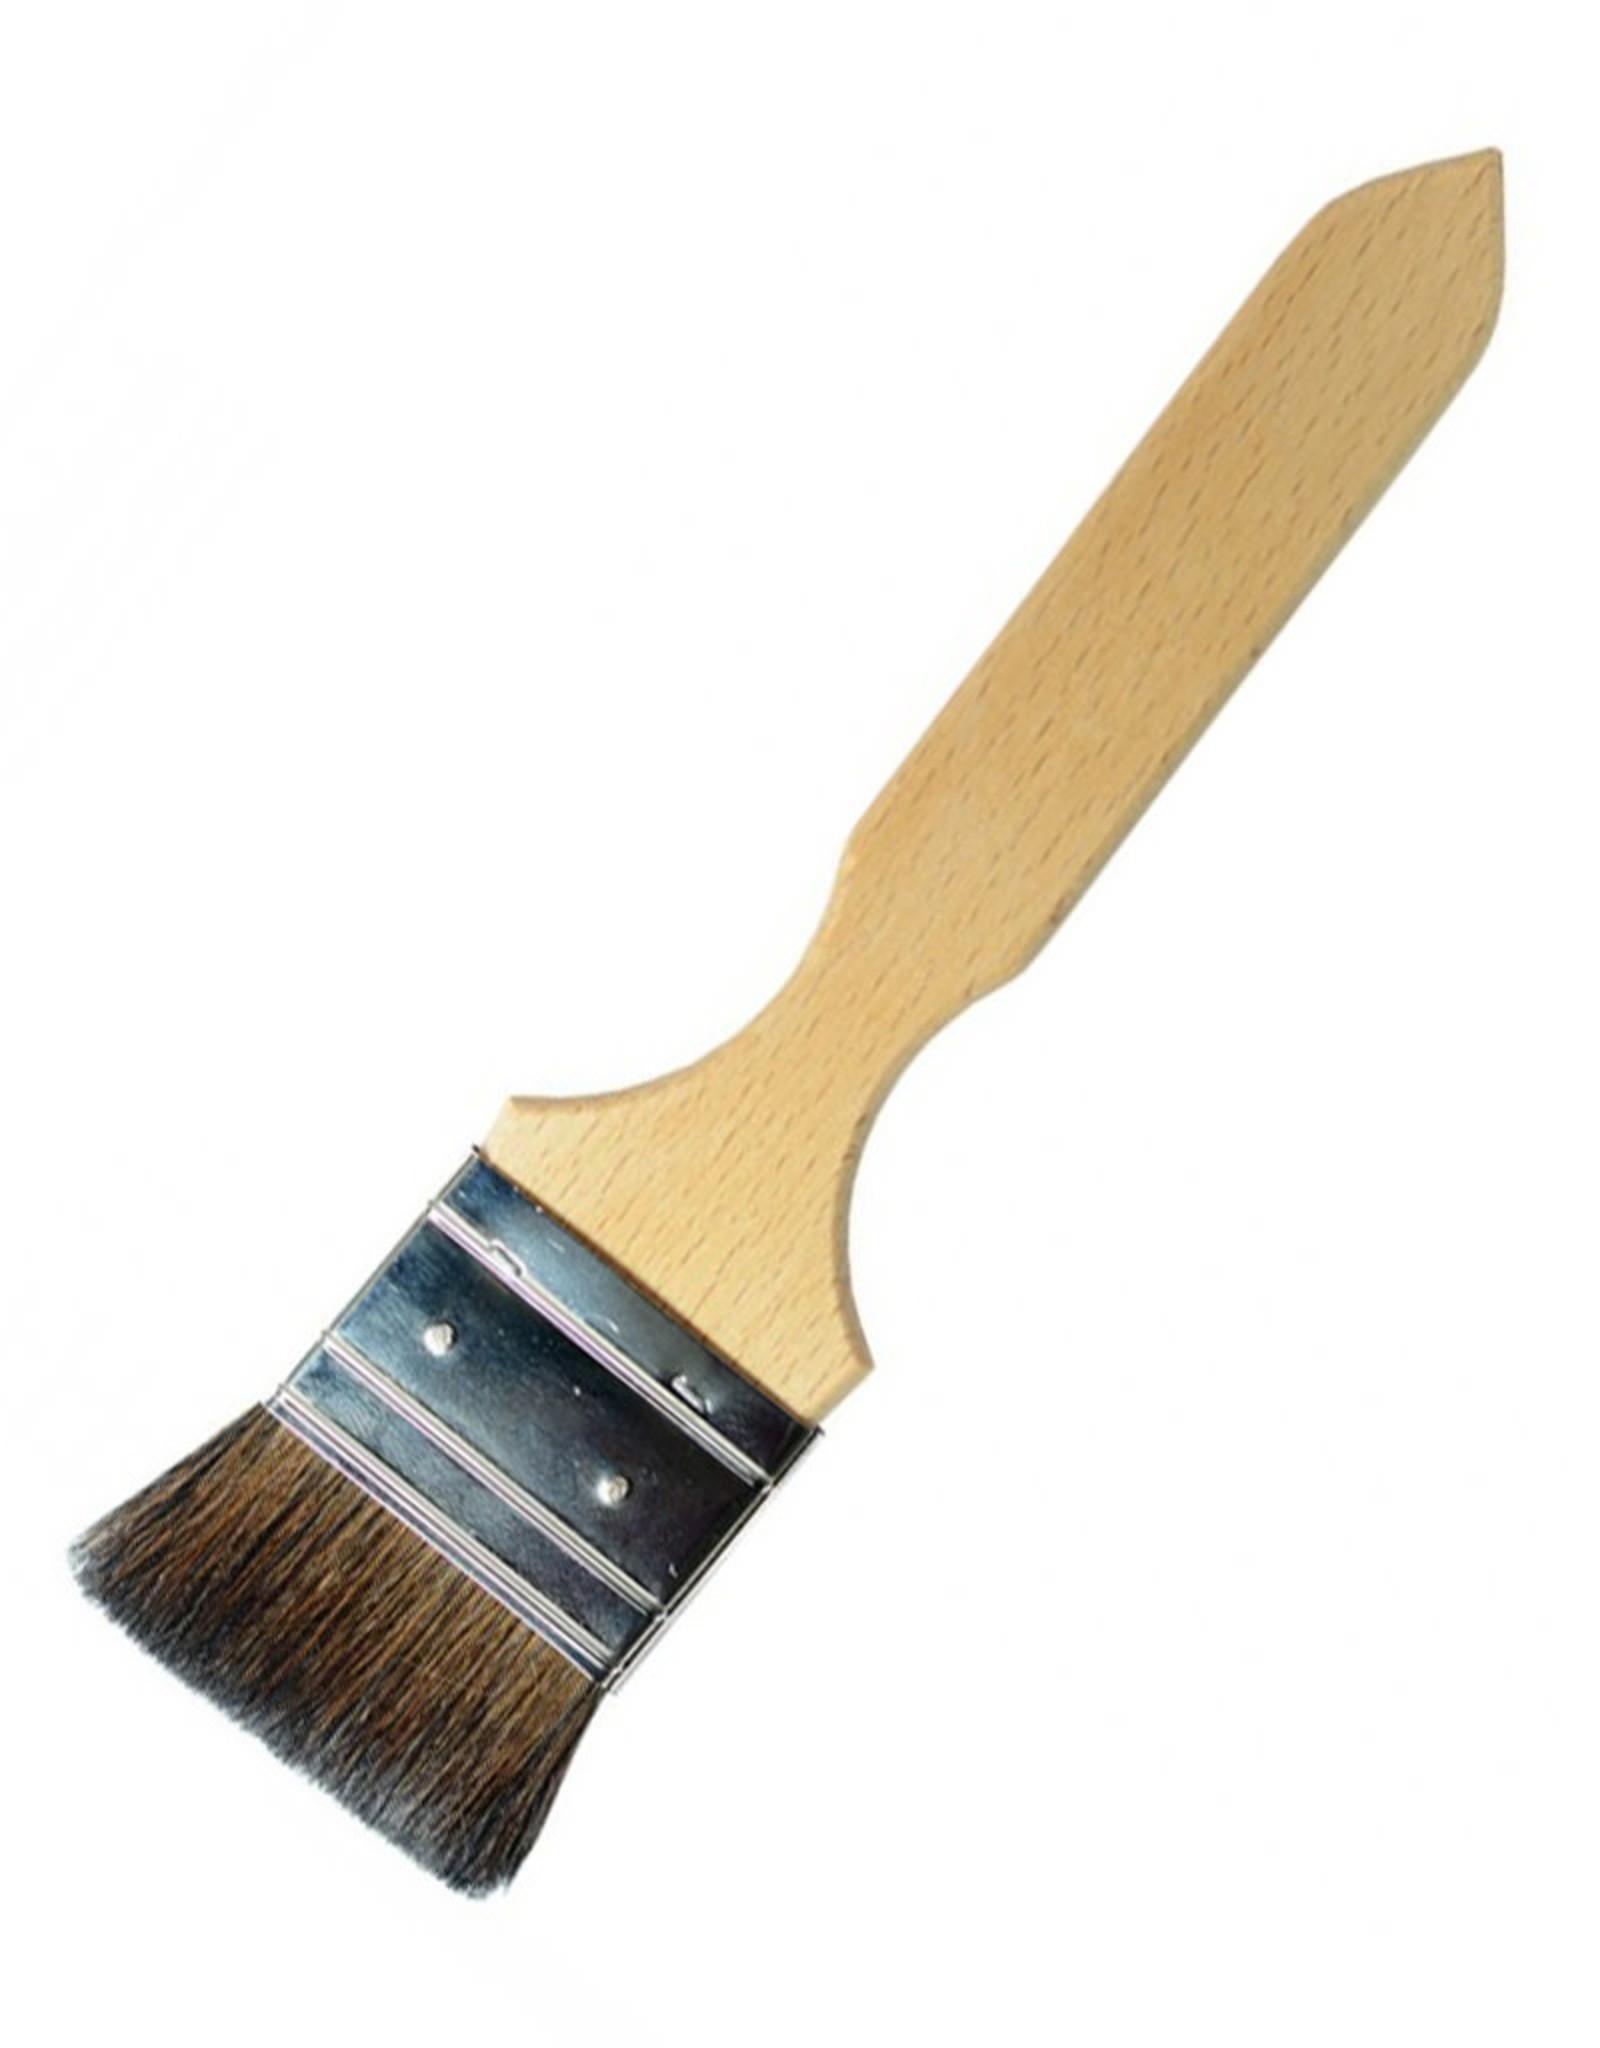 "A. S. Handover Handover Series 698 - Squirrel Hair Flat Laquer Brush Maat: 1.5"" (38mm)"